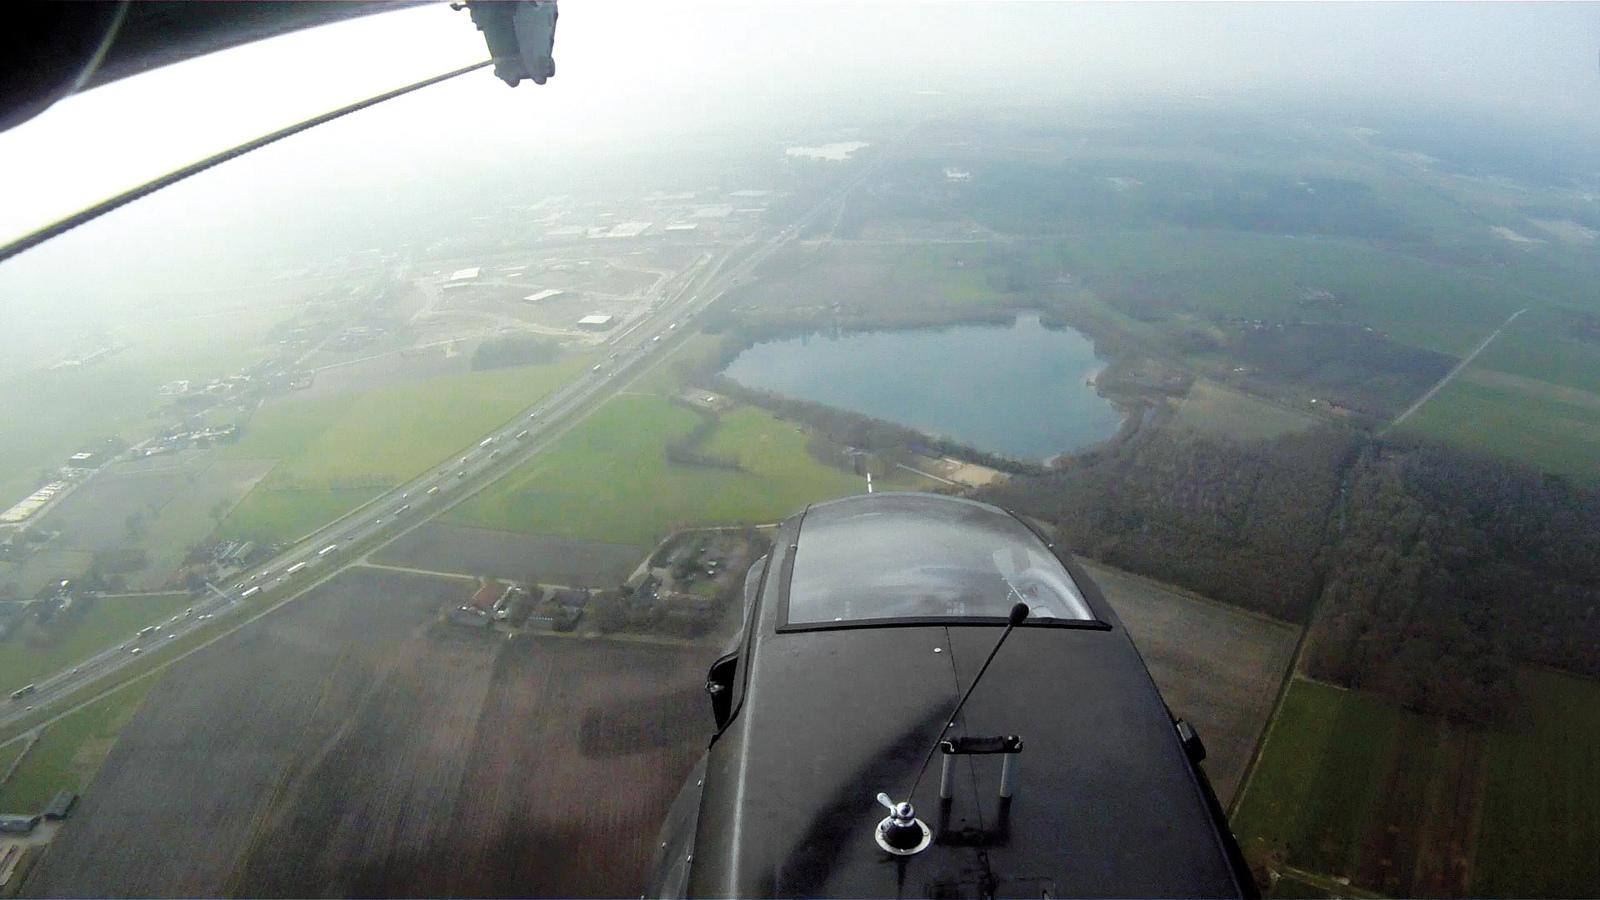 PAL-V aerial view